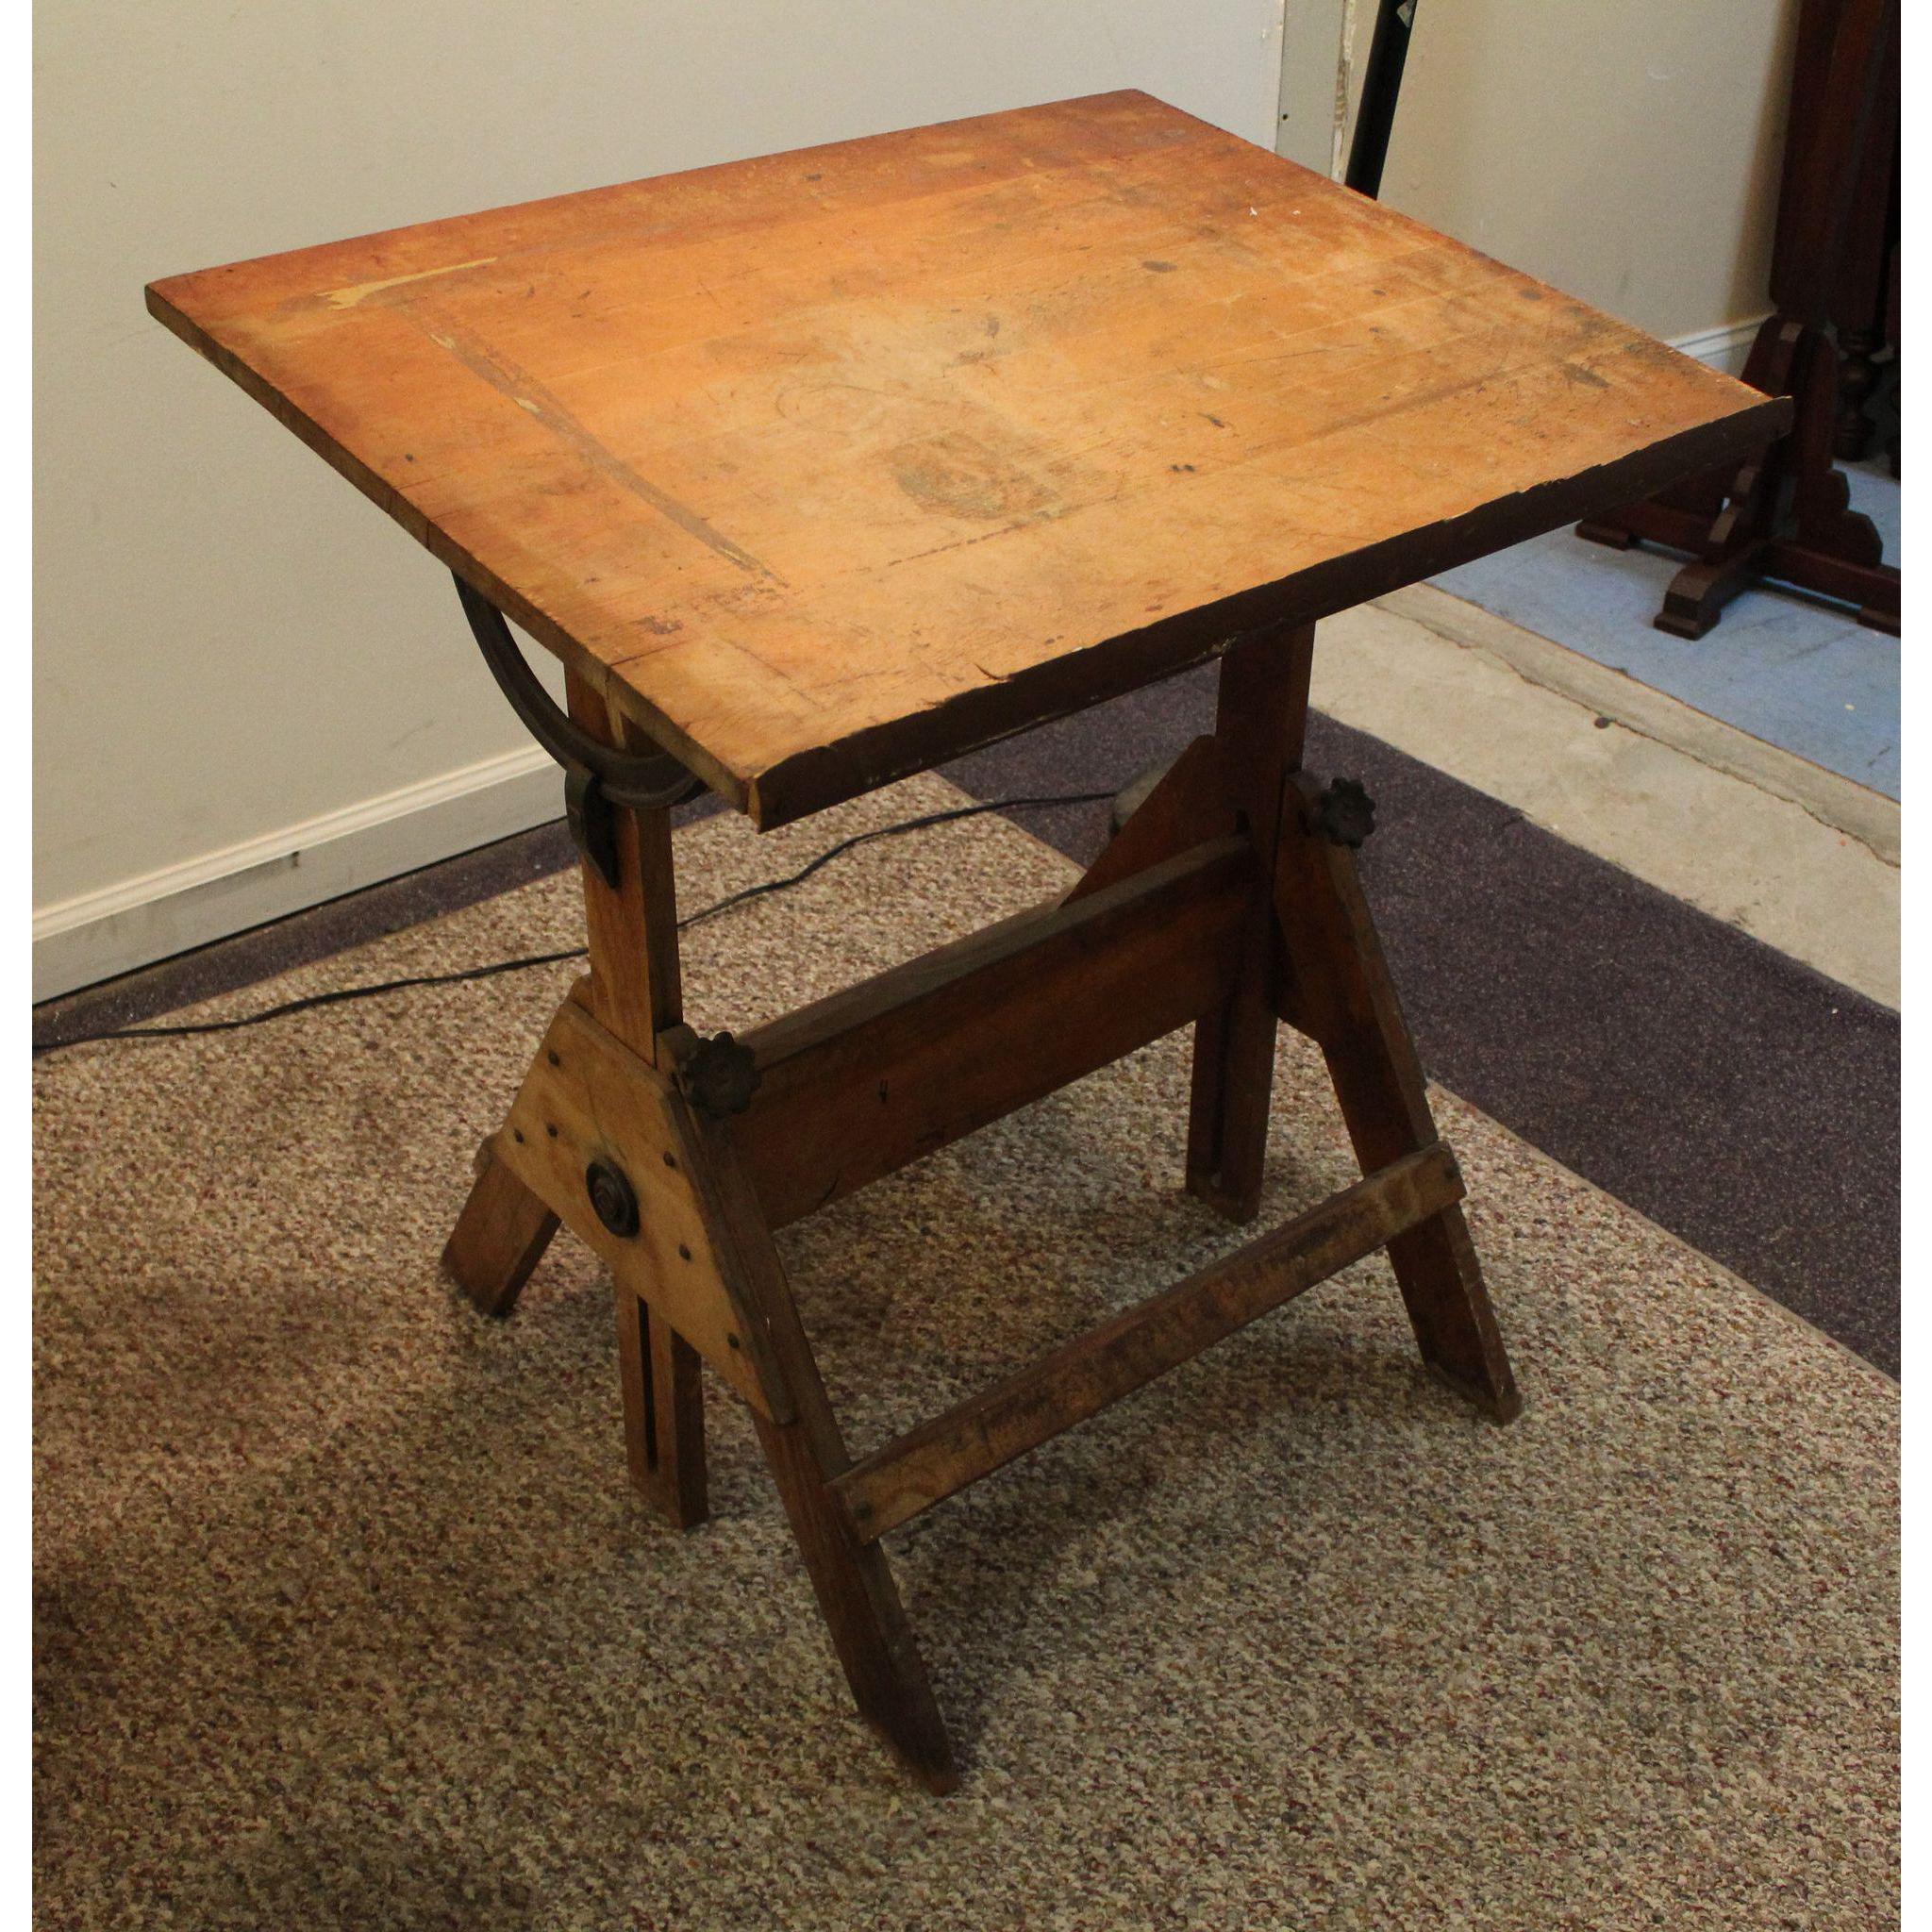 Amazing Vintage Anco Bilt Adjustable Drafting Table/Desk